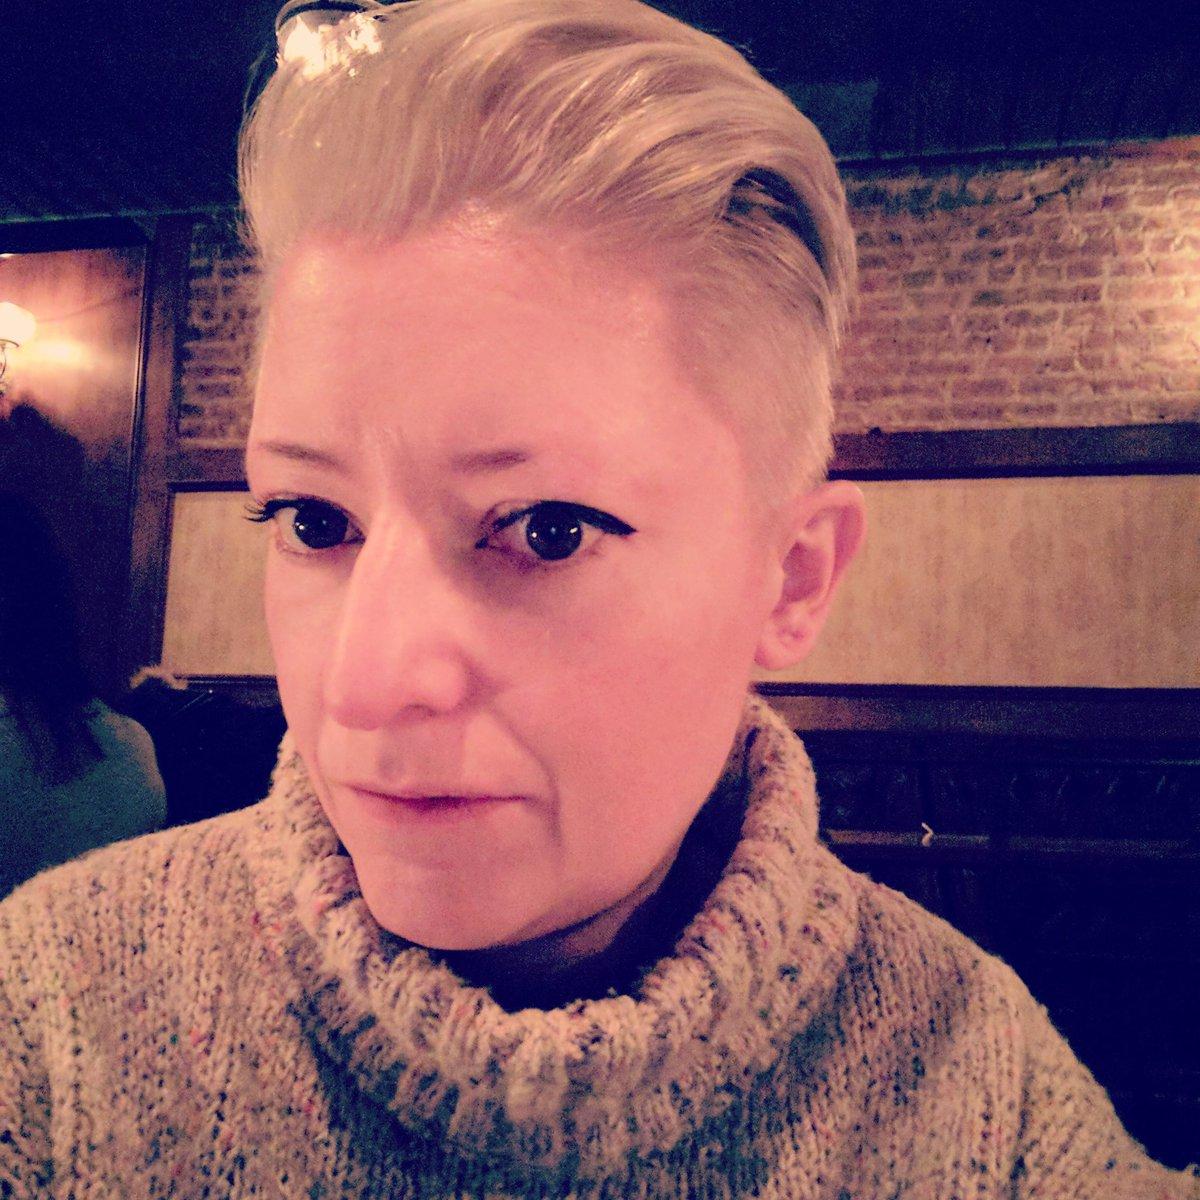 Elizabeth Spiers On Twitter Just Got A New David Lynch Ish Haircut